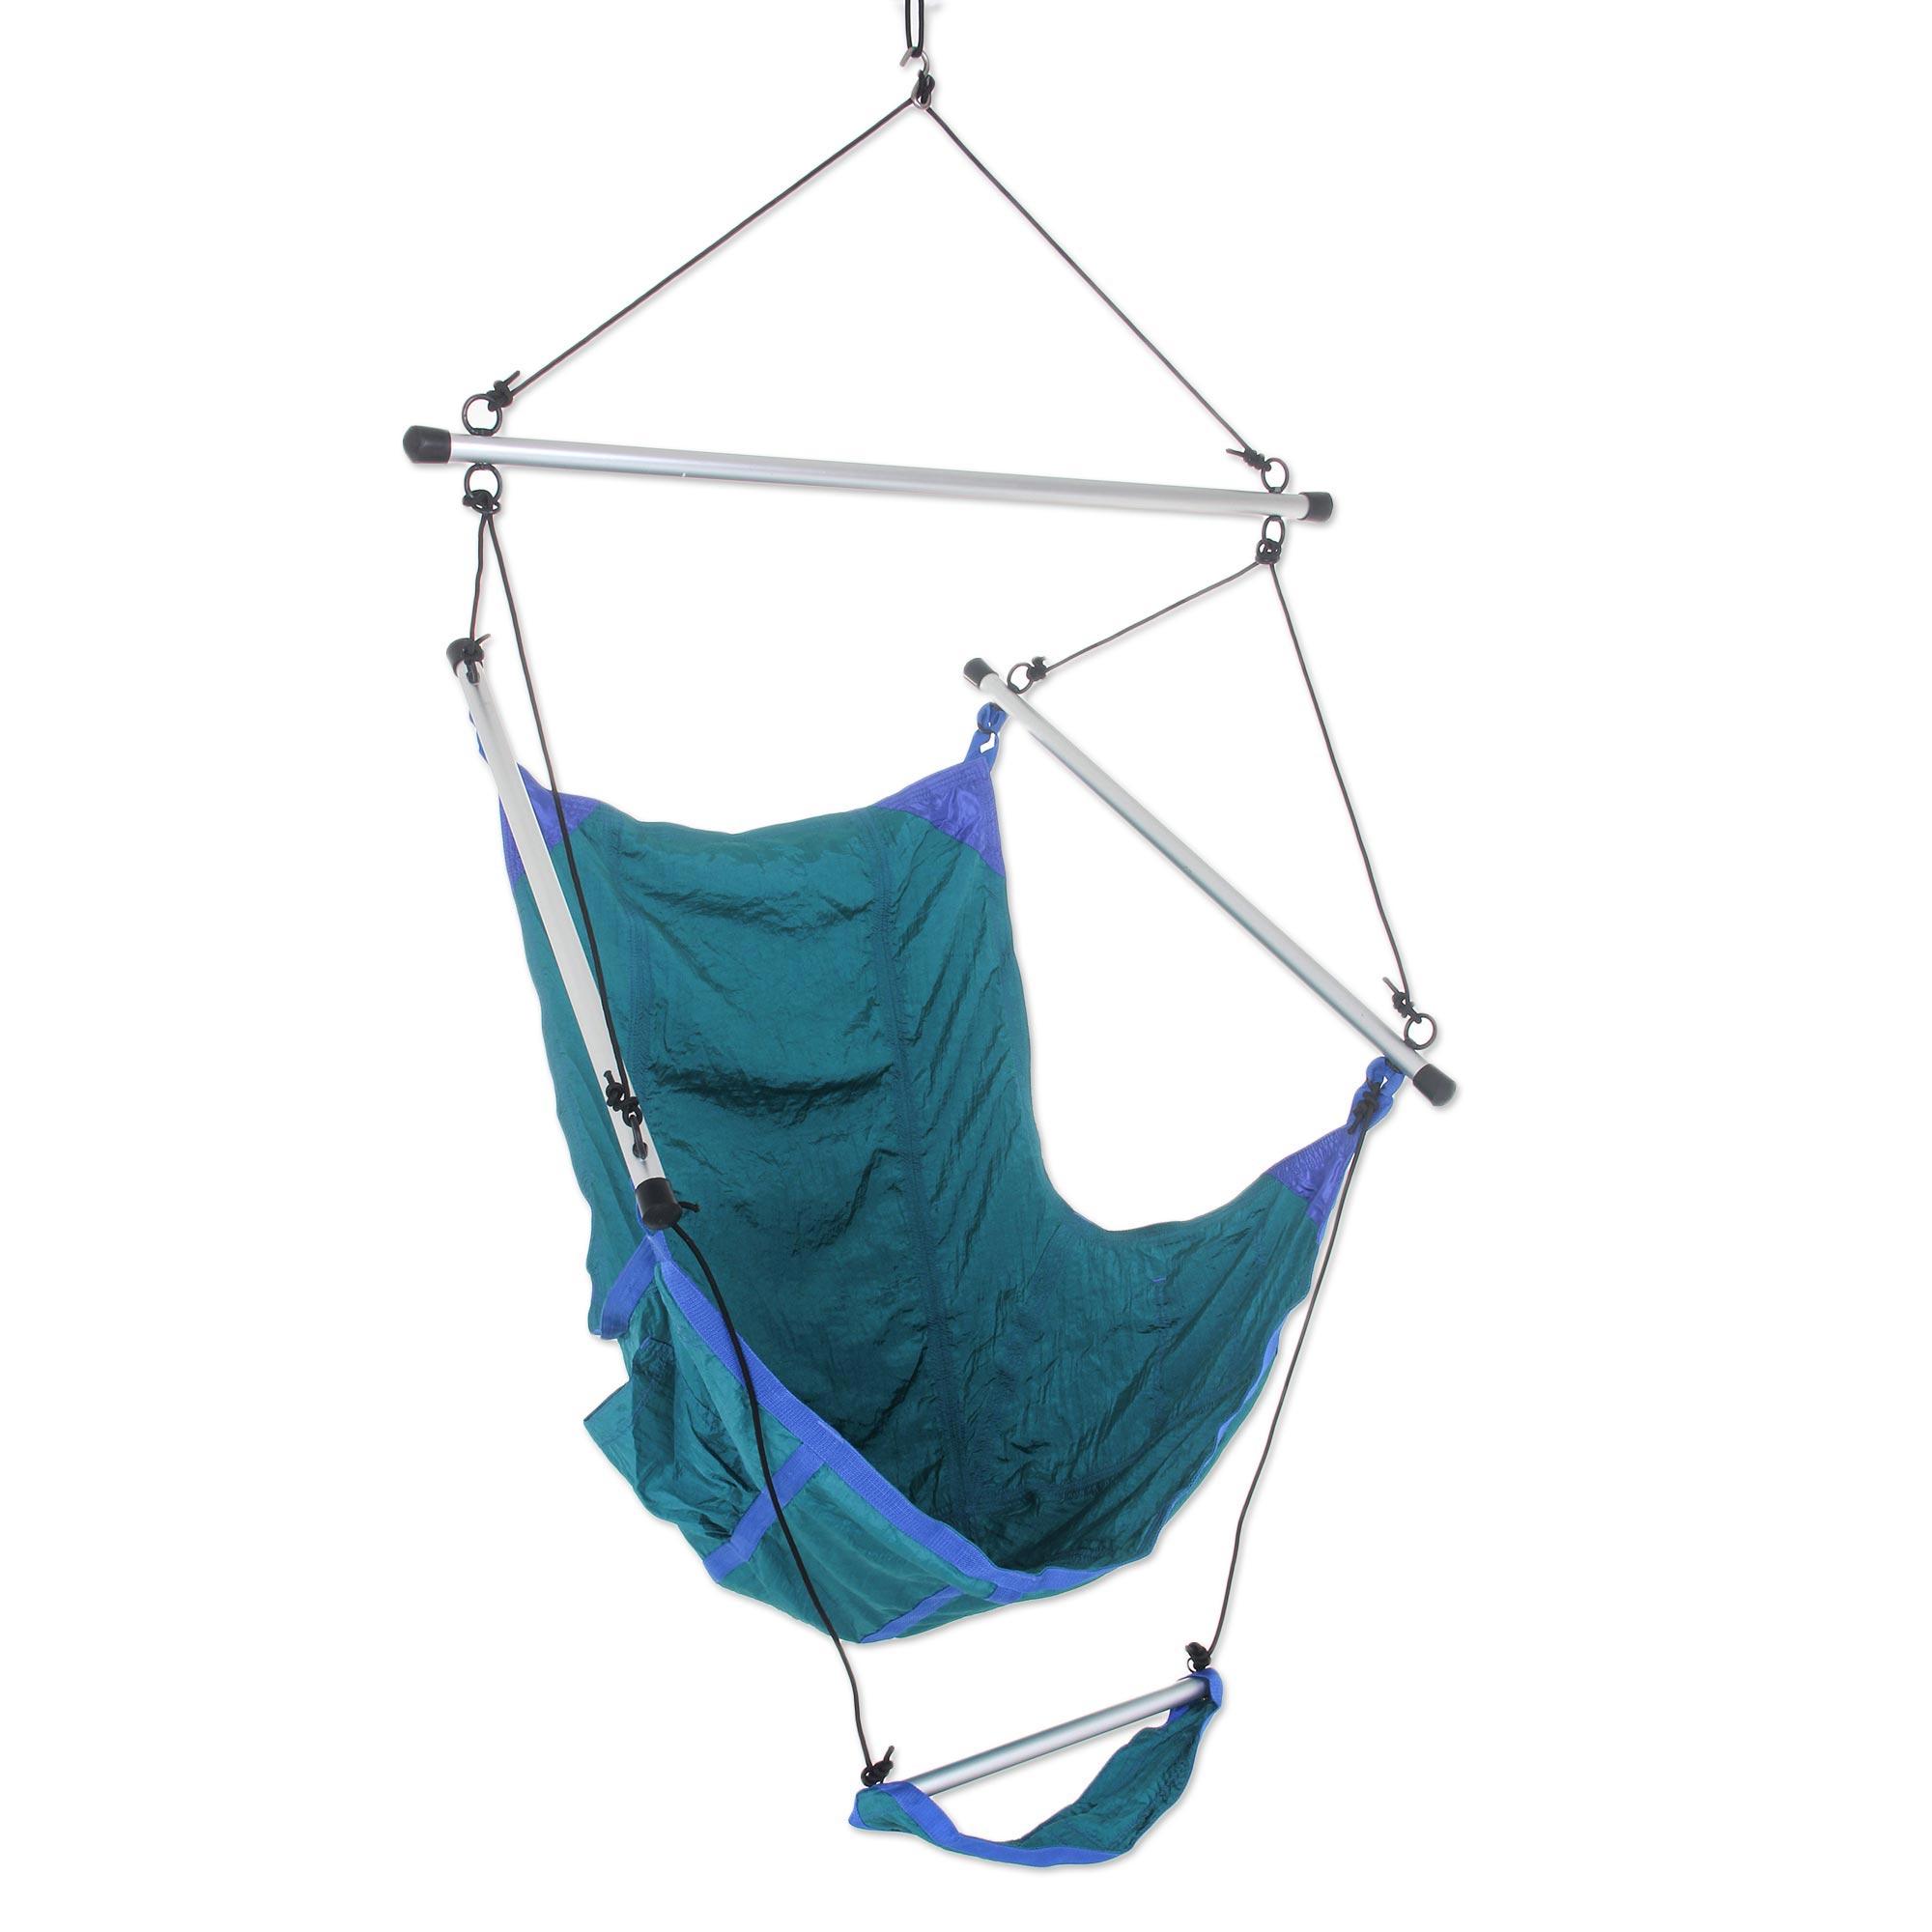 Teal Parachute Hammock Swing Portable Hanging Chair Nusa Dua